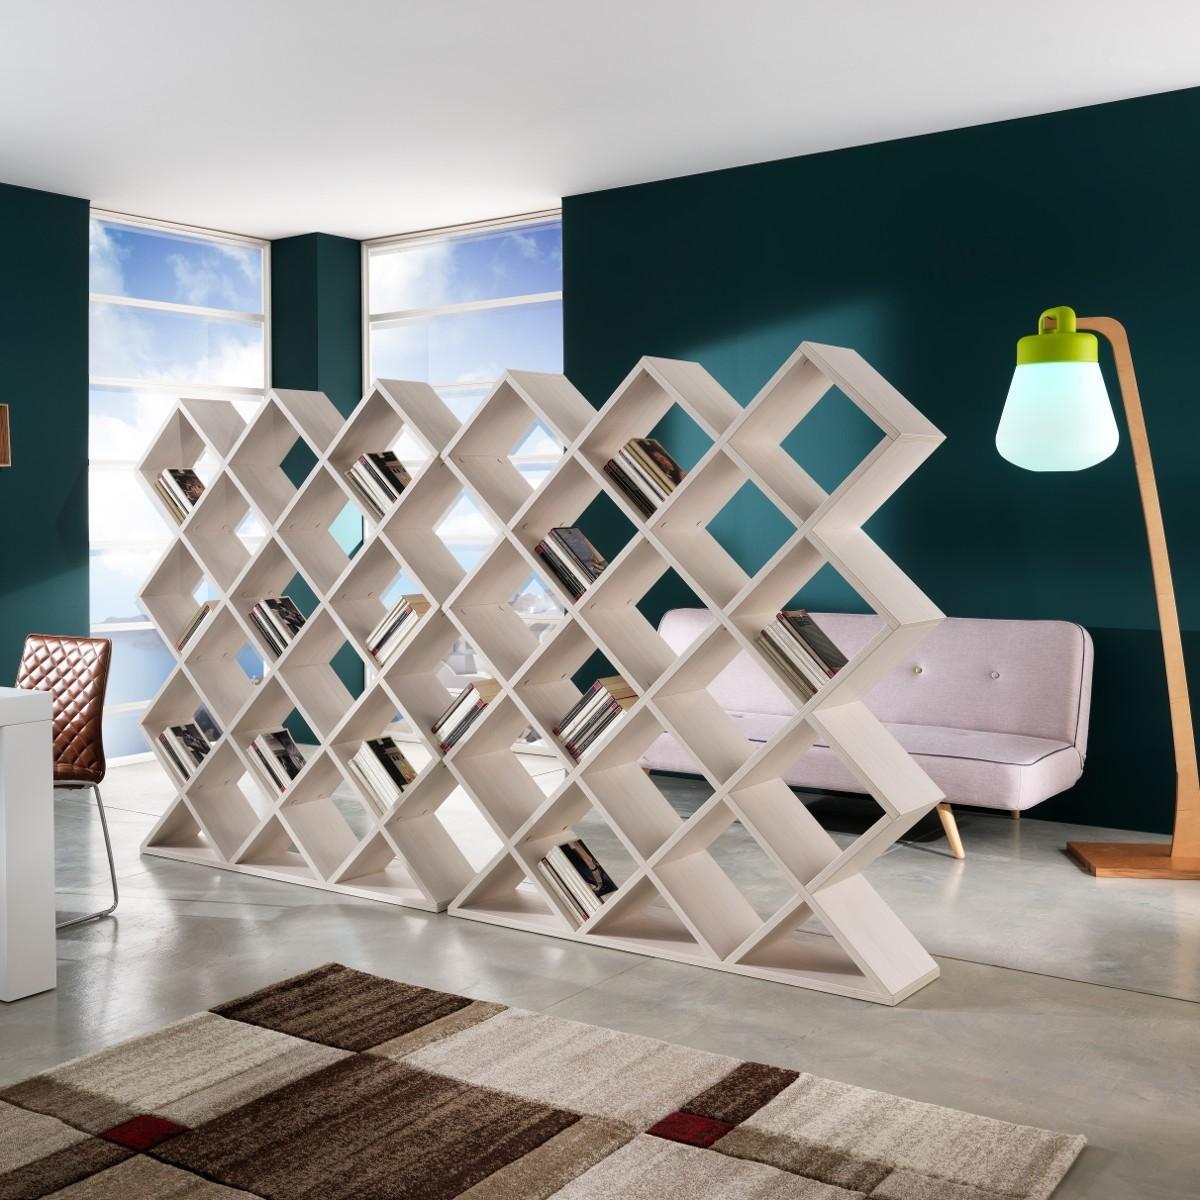 Libreria separa ambienti mynest in legno bianco 140 x 160 cm - Libreria parete divisoria ...